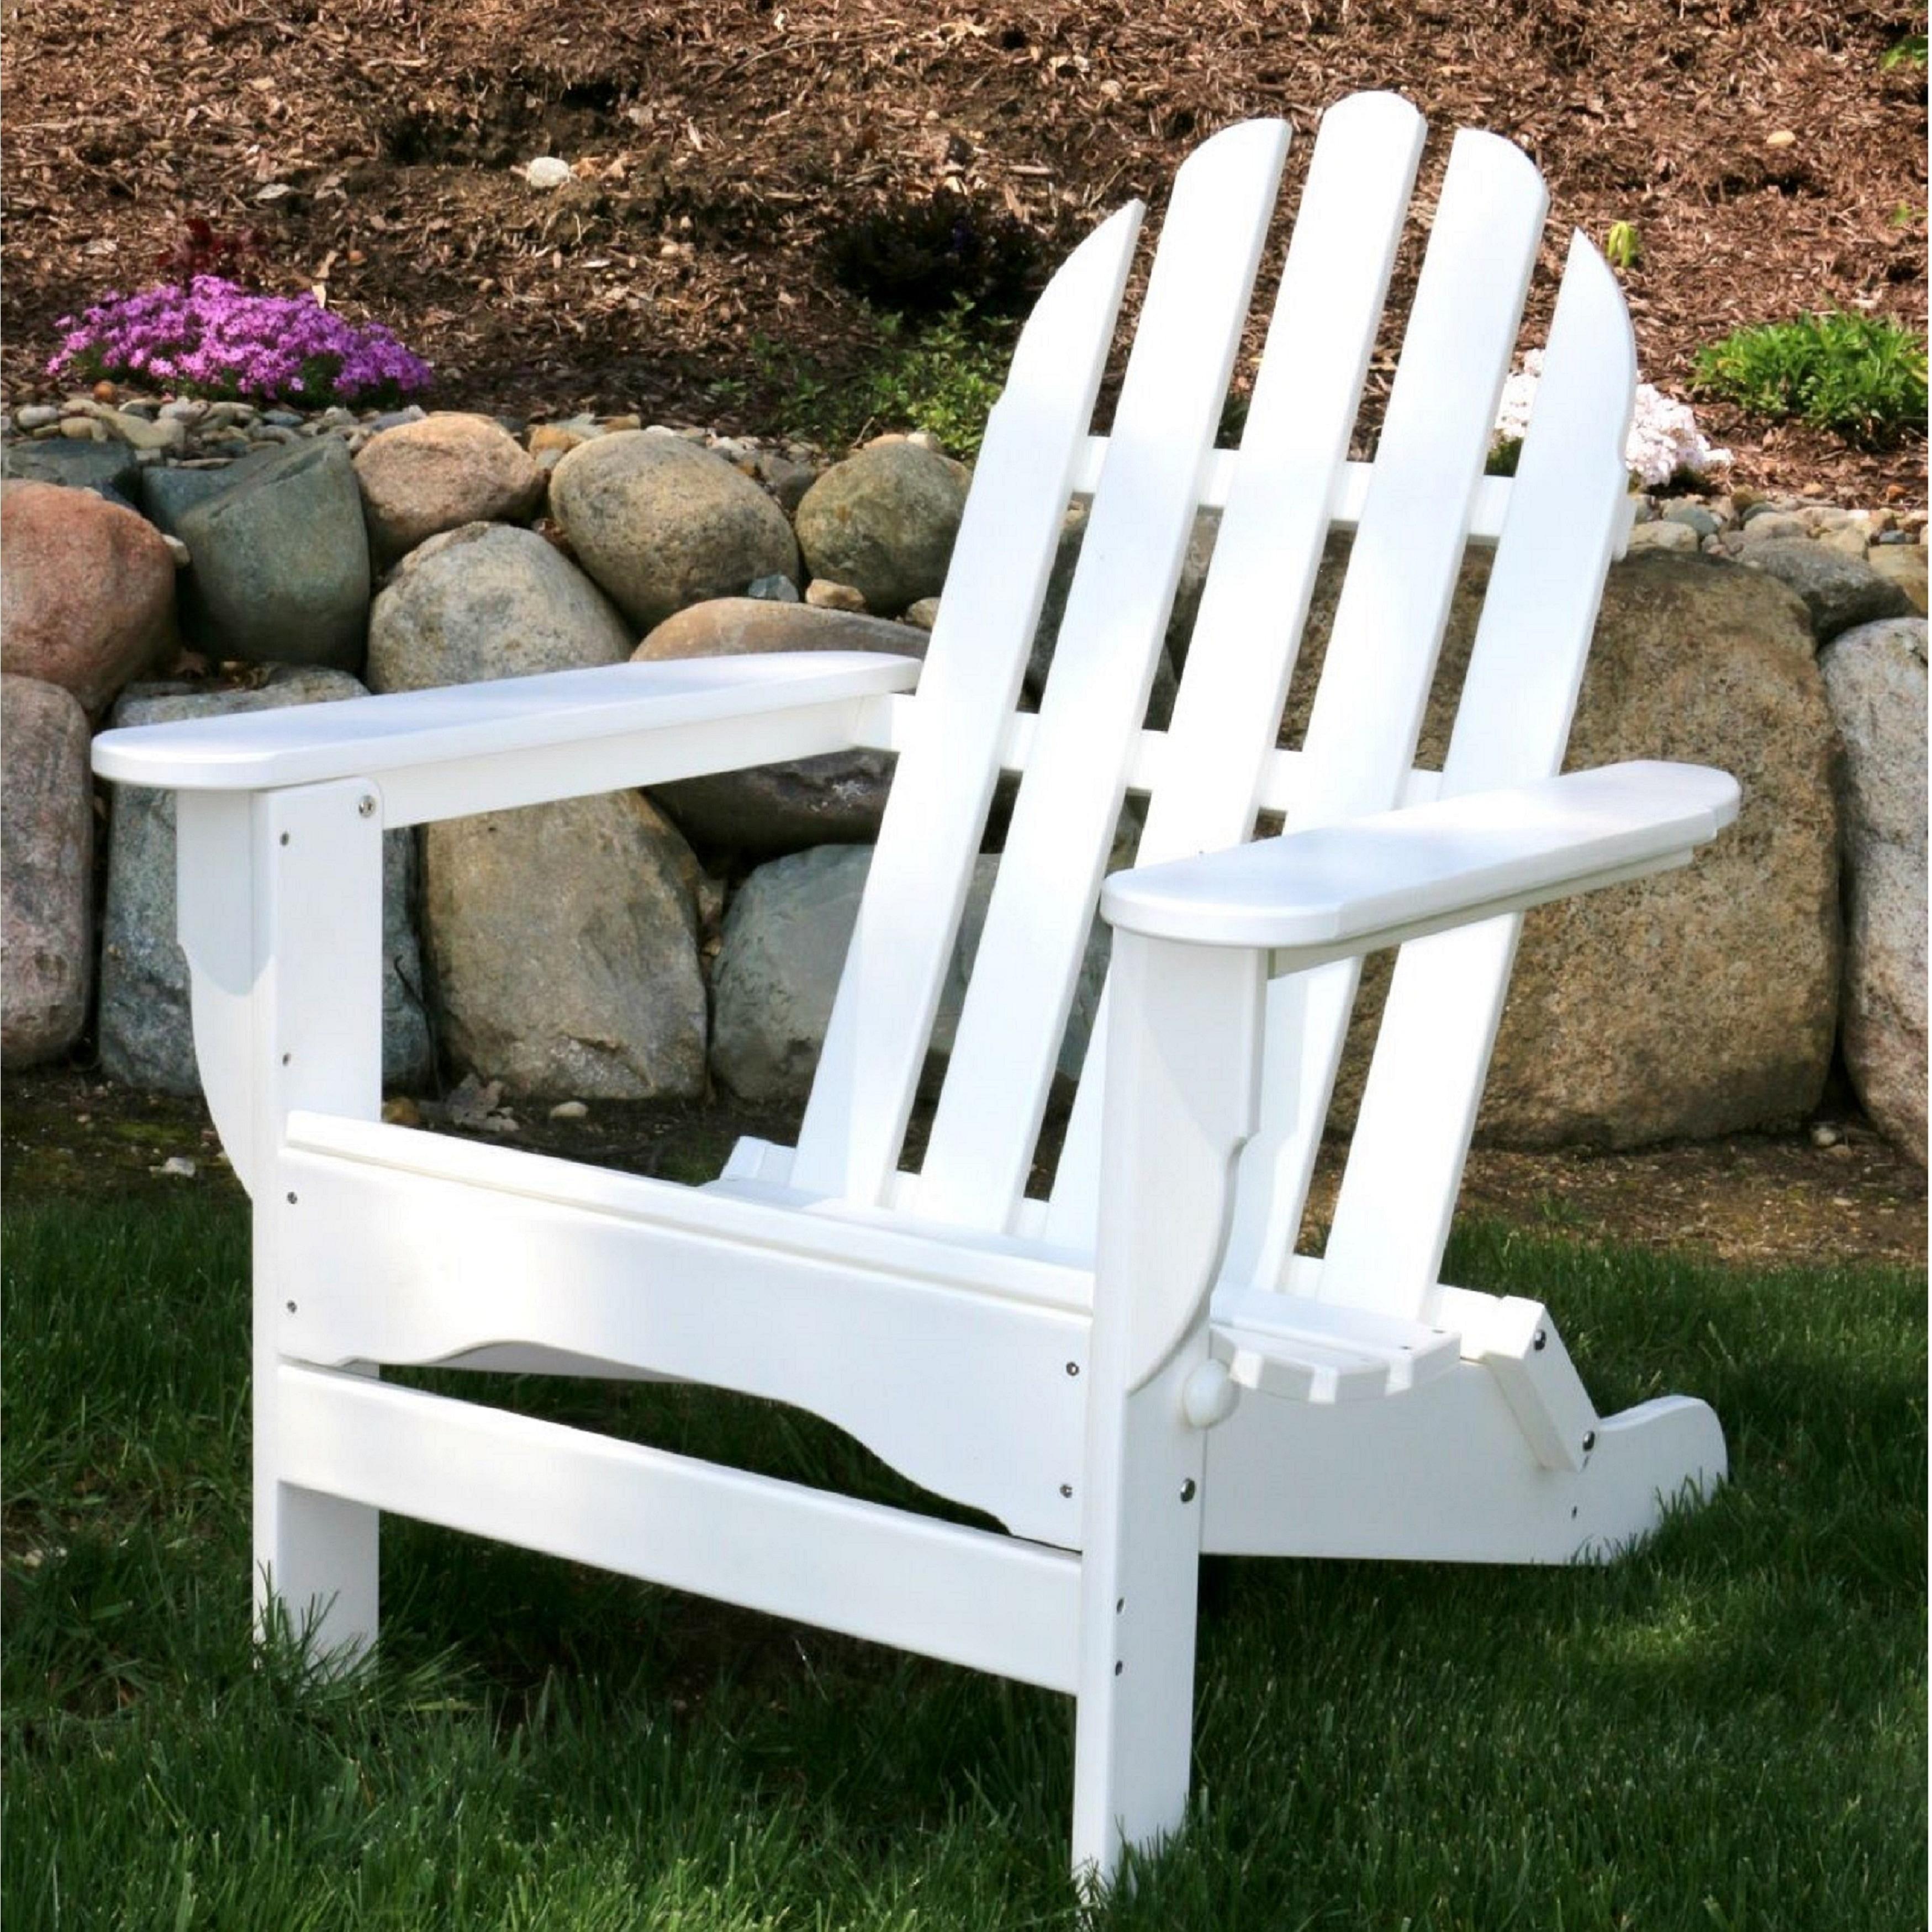 Marvelous DuroGreen All Weather Adirondack Chair